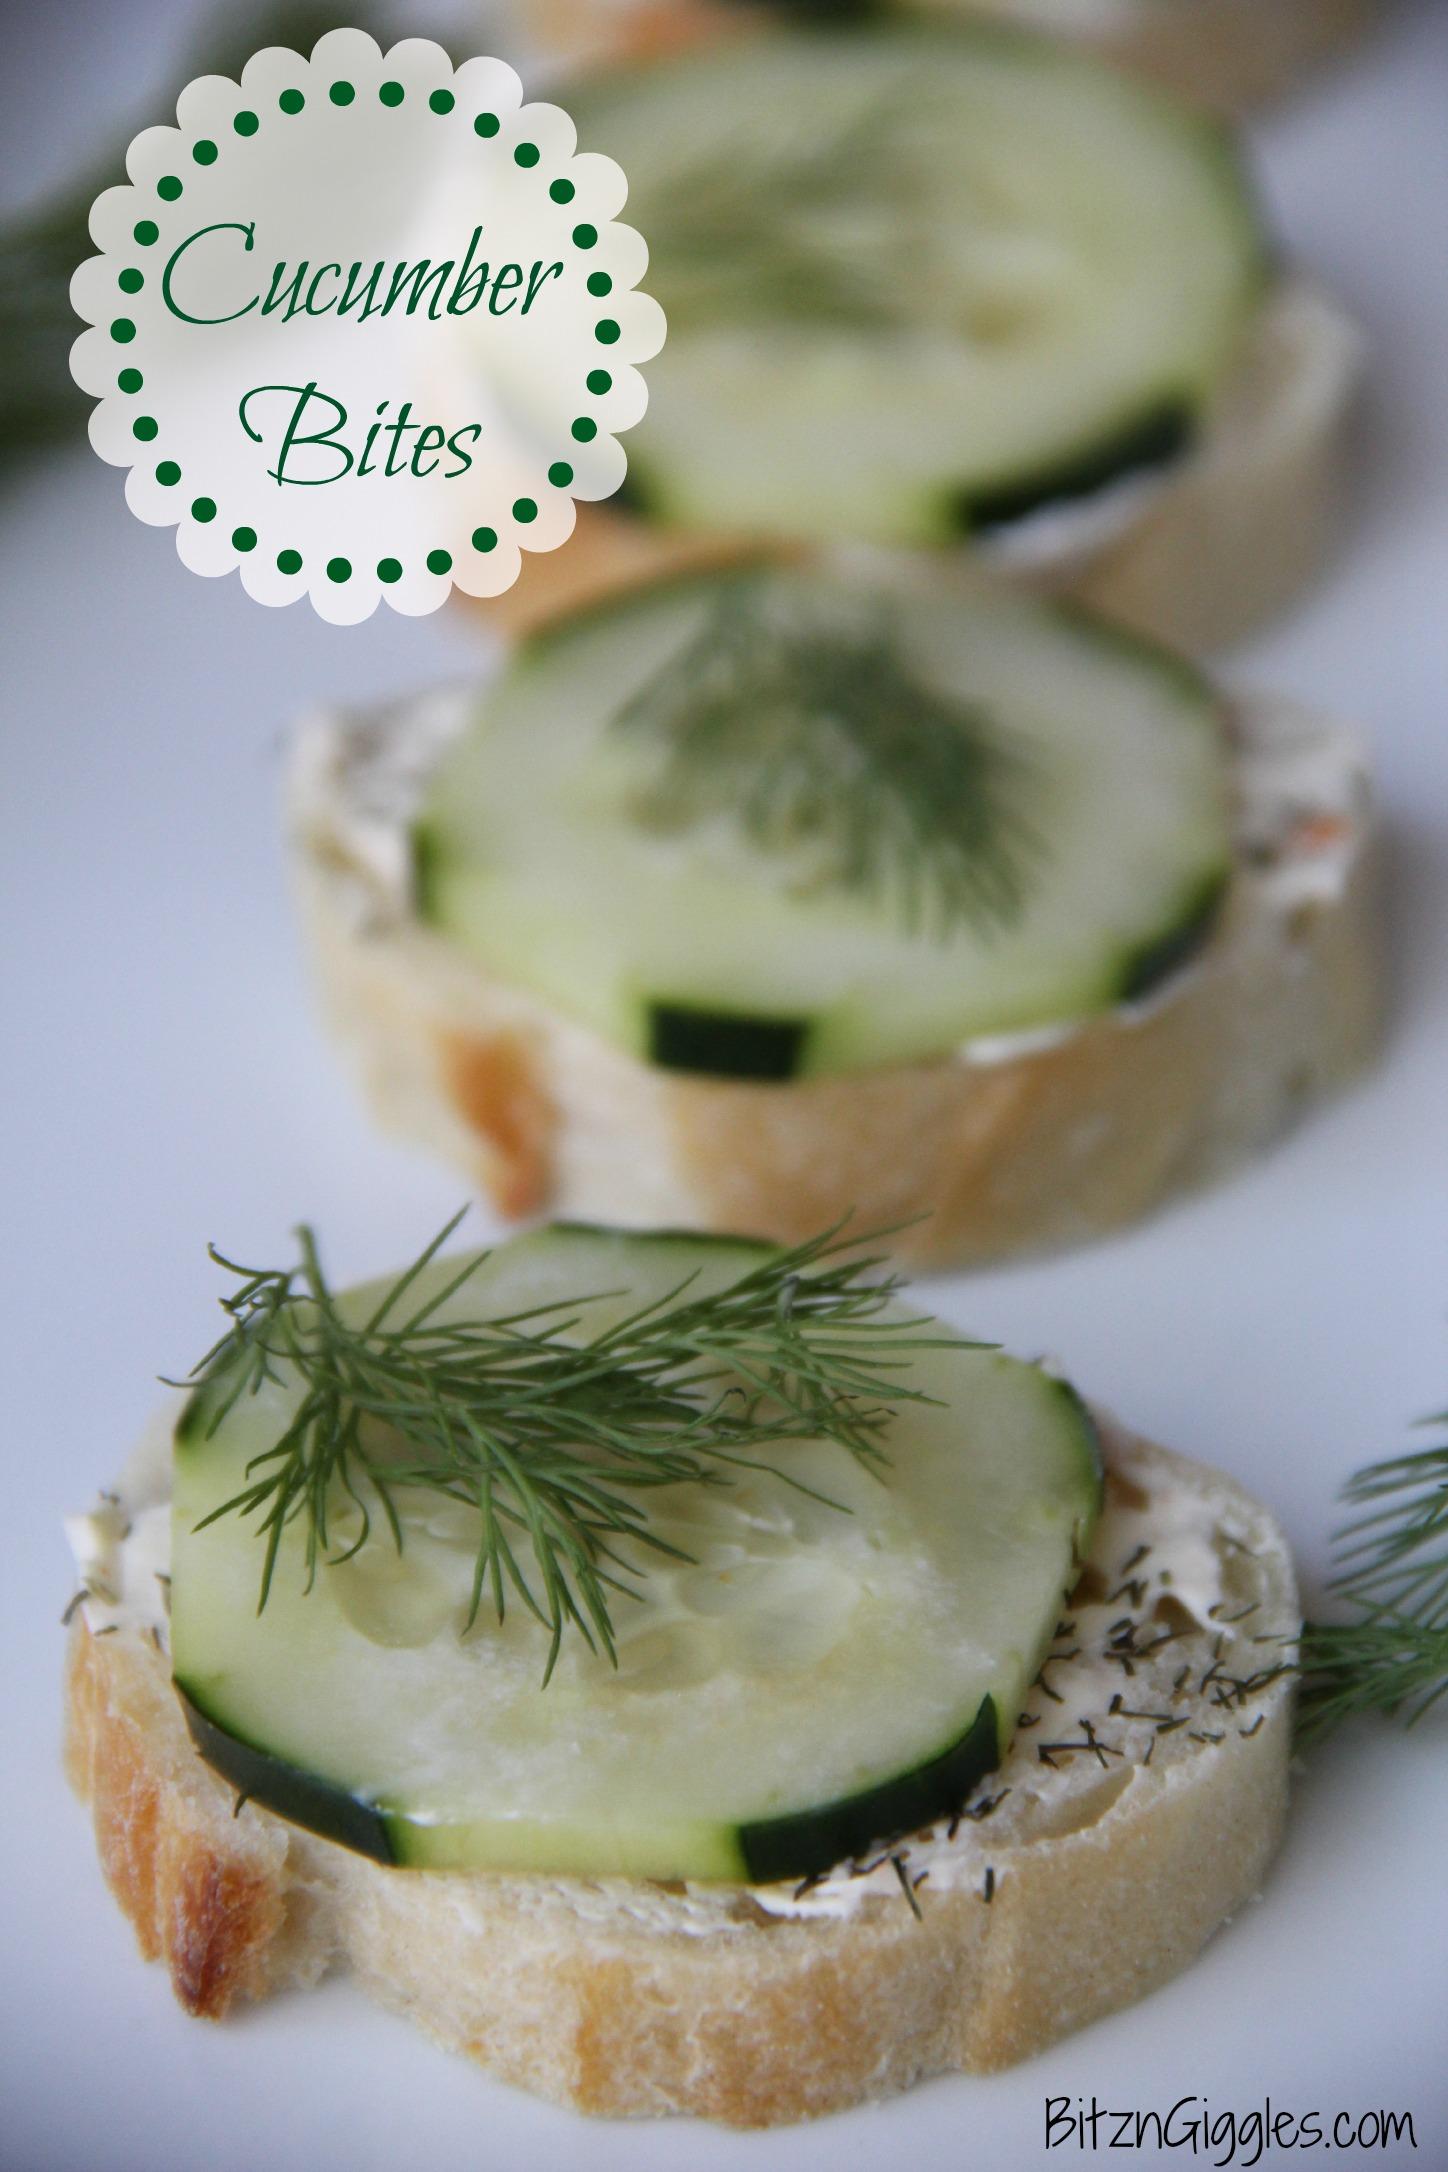 Cucumber Bites - Bitz & Giggles